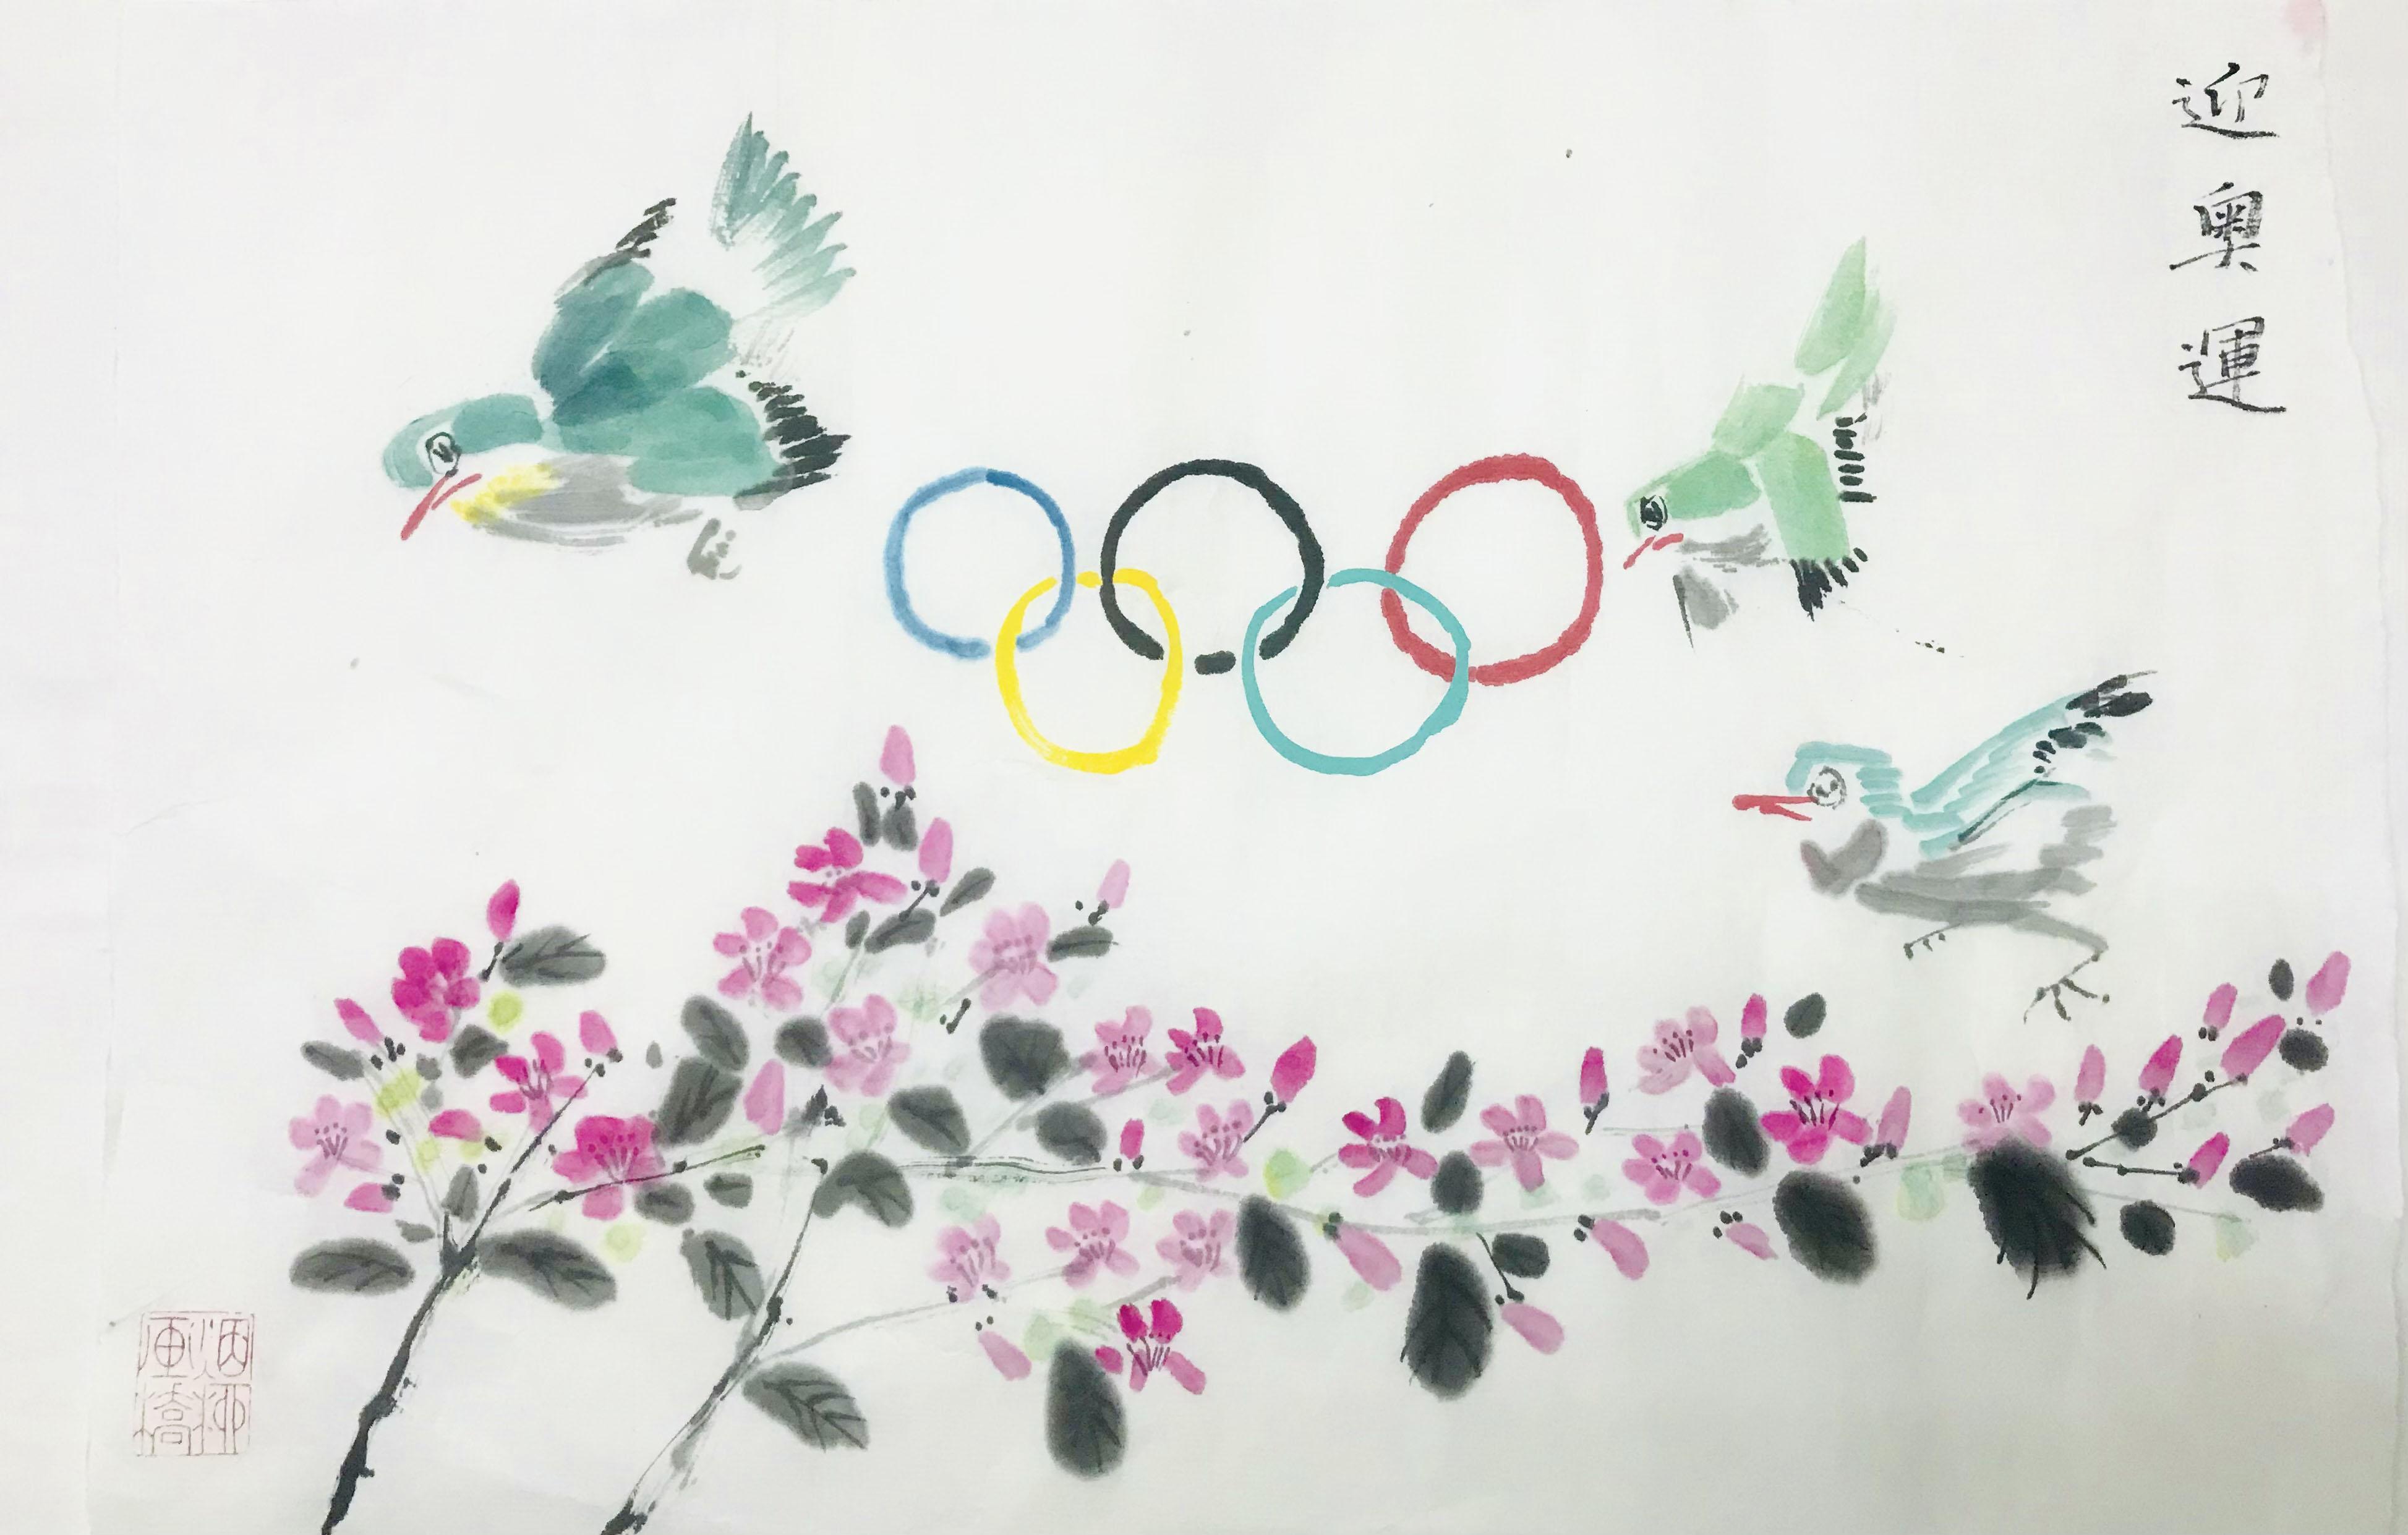 迎奥运 Greet The Olympics——汤博文 Tang Bowen 12